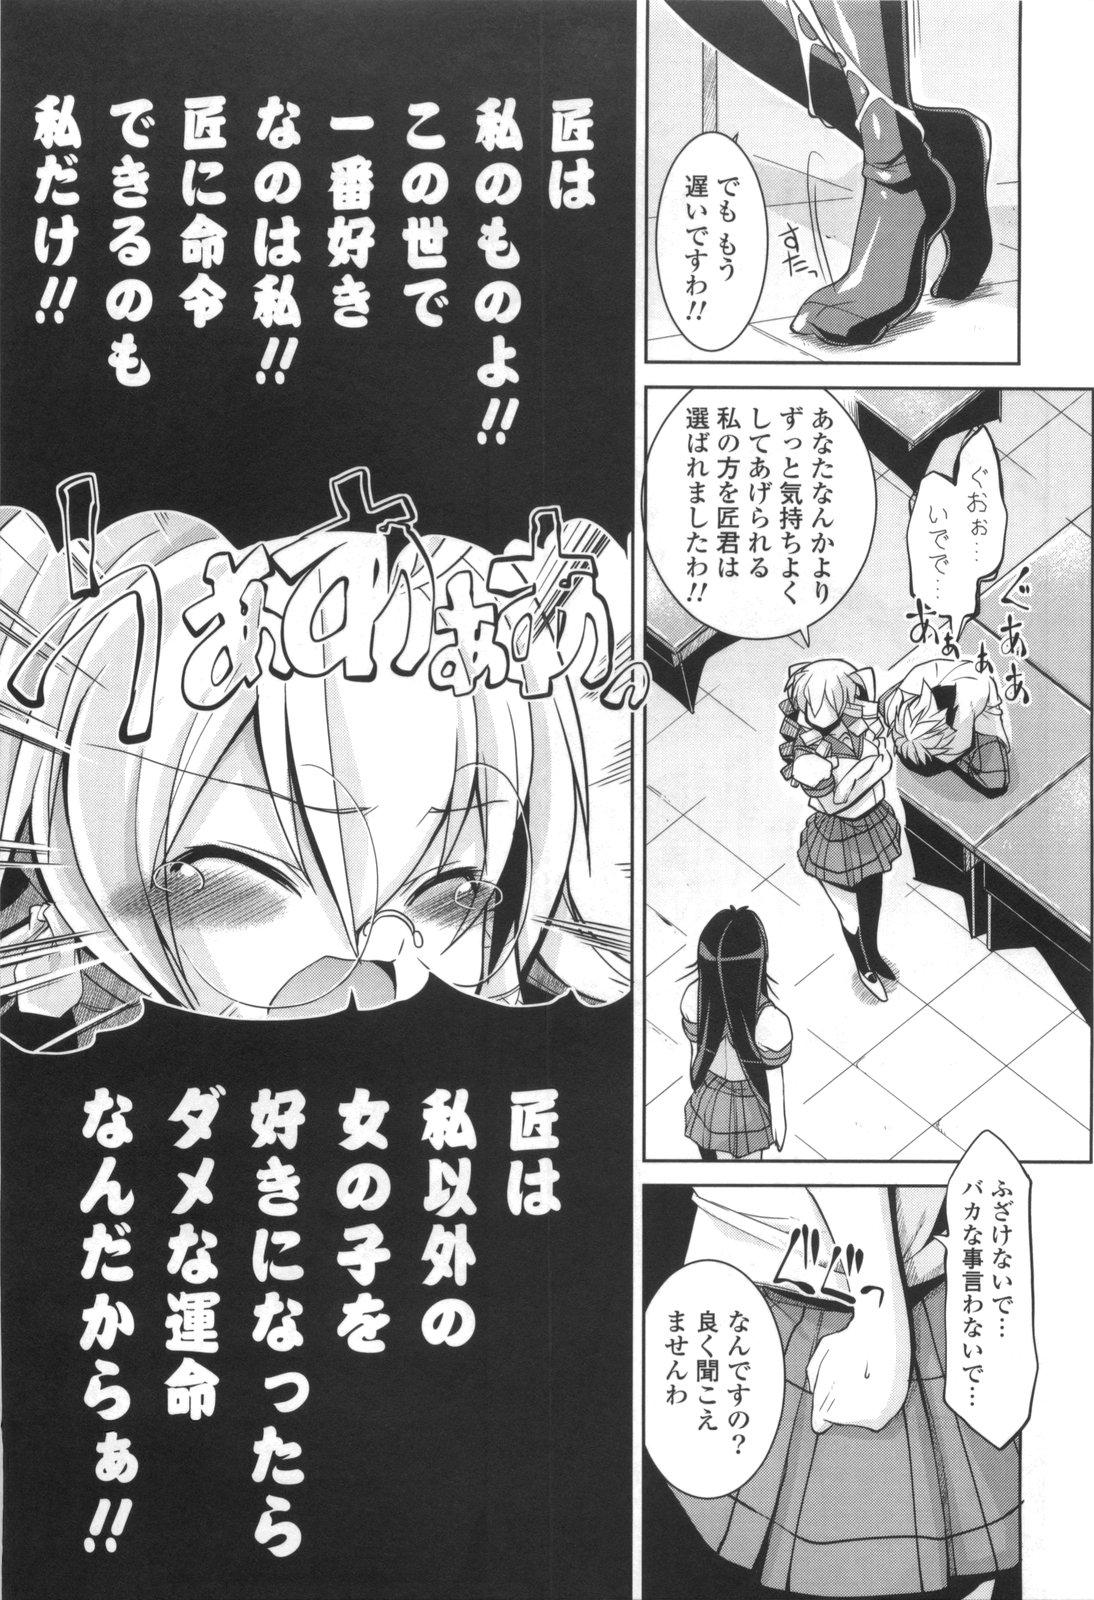 [Gyonikun] Gosyujin-sama Senyou!? Ami-sama Senyou 186